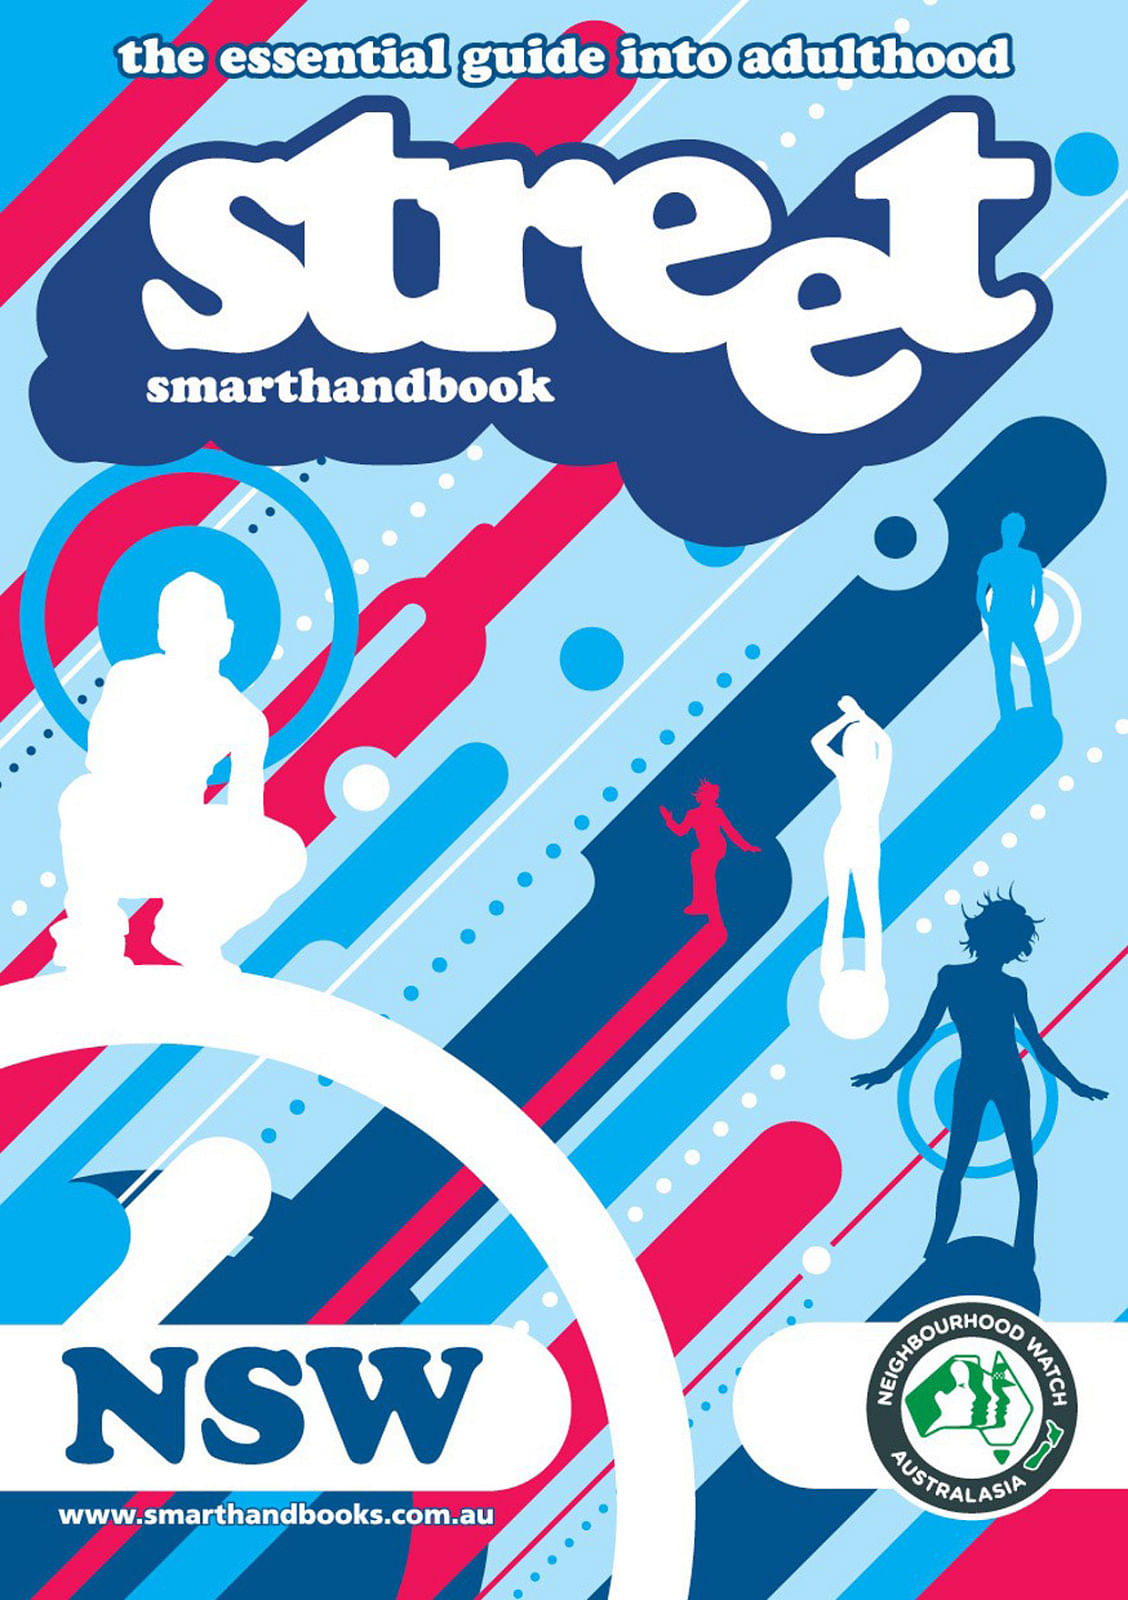 Link to the the Street Smart Handbook.